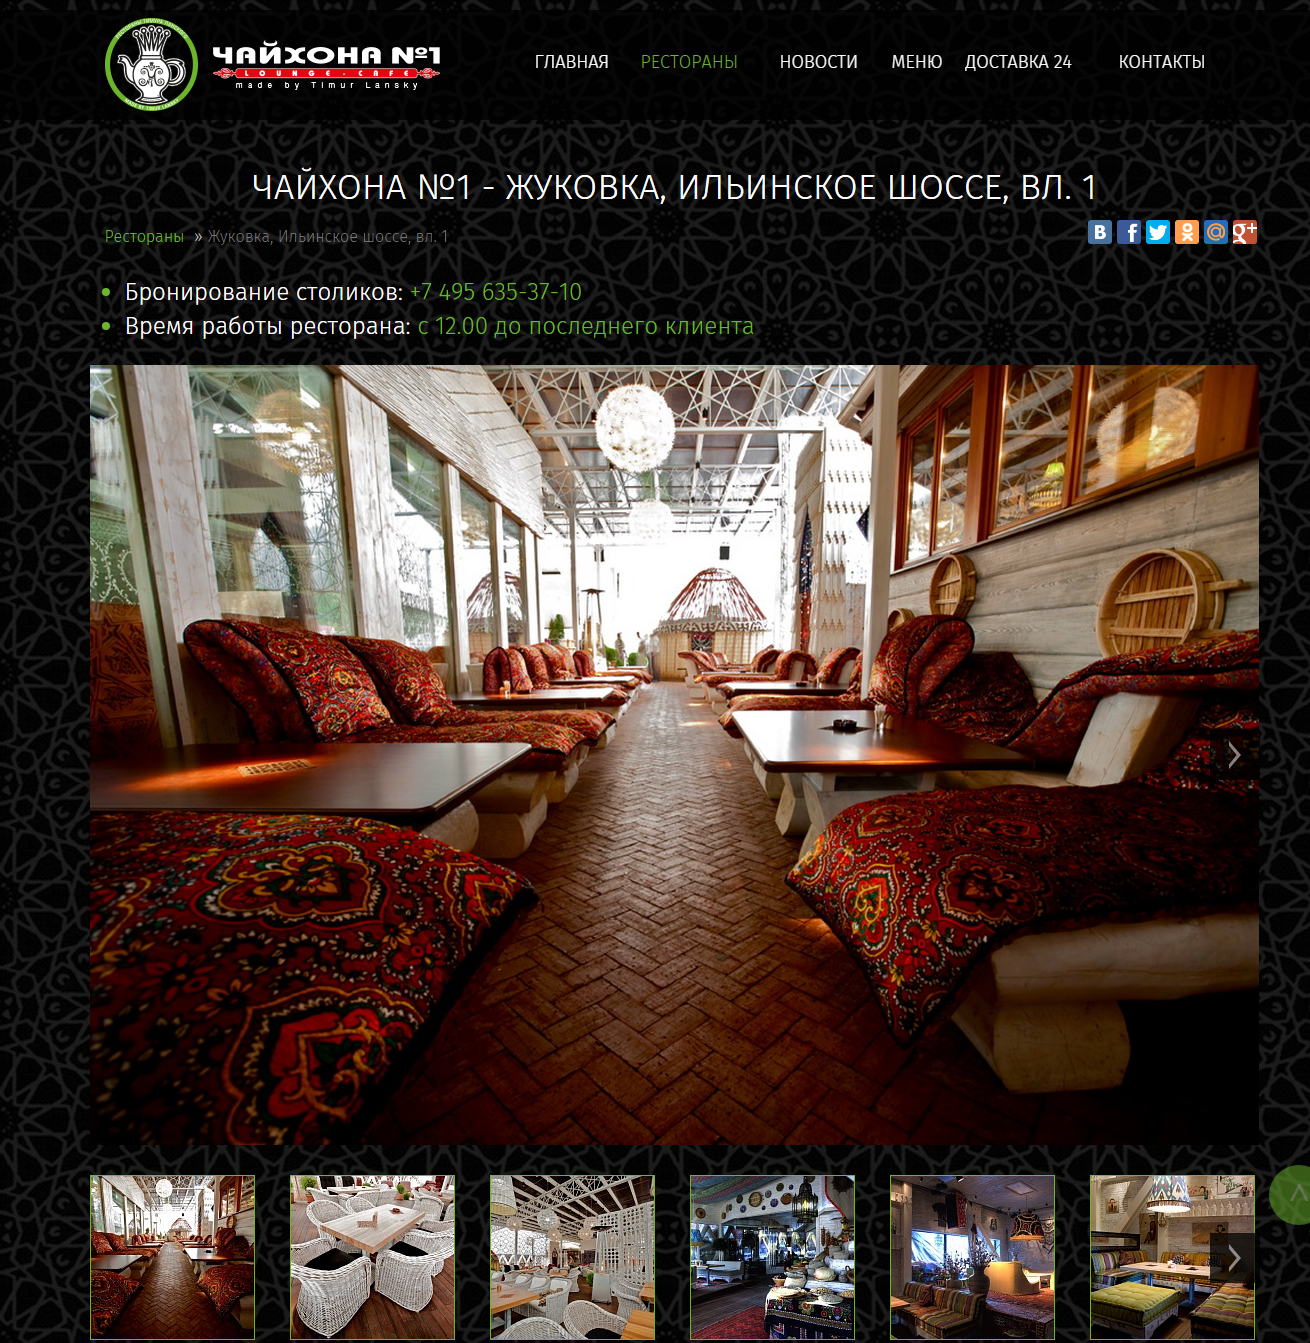 FireShot Capture 16 - Чайхона №1 в Жуковке, Ильинское шосс_ - https___chaihona1.ru_addresses_place_8